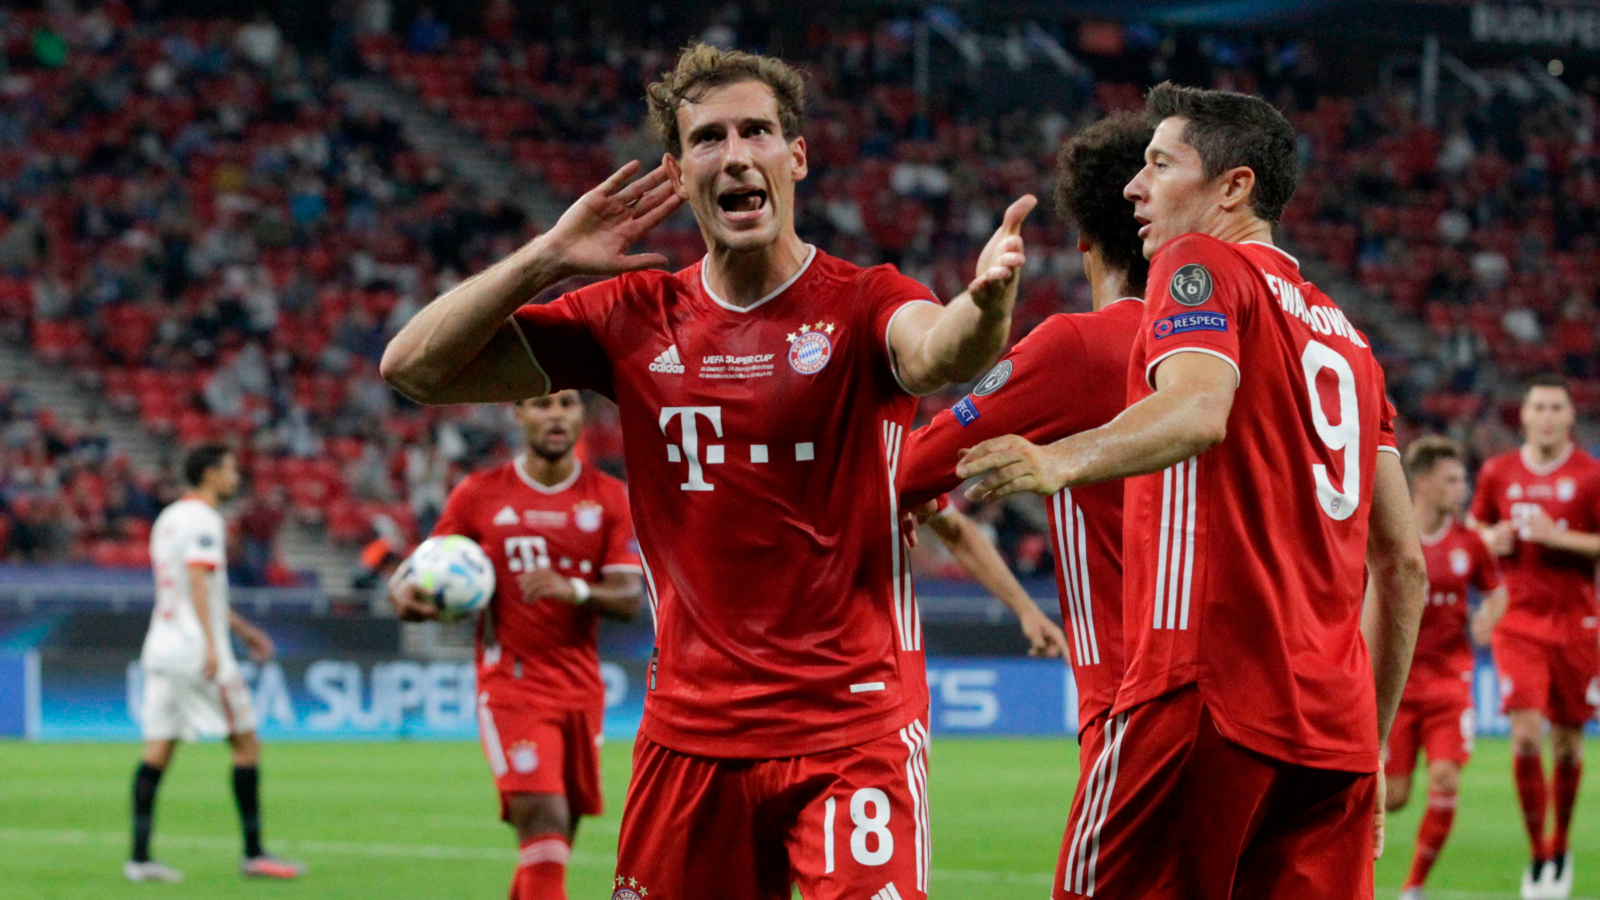 El resumen de la final de la Supercopa de Europa, Bayen Múnich vs. Sevilla:  vídeo, goles y estadísticas | Goal.com